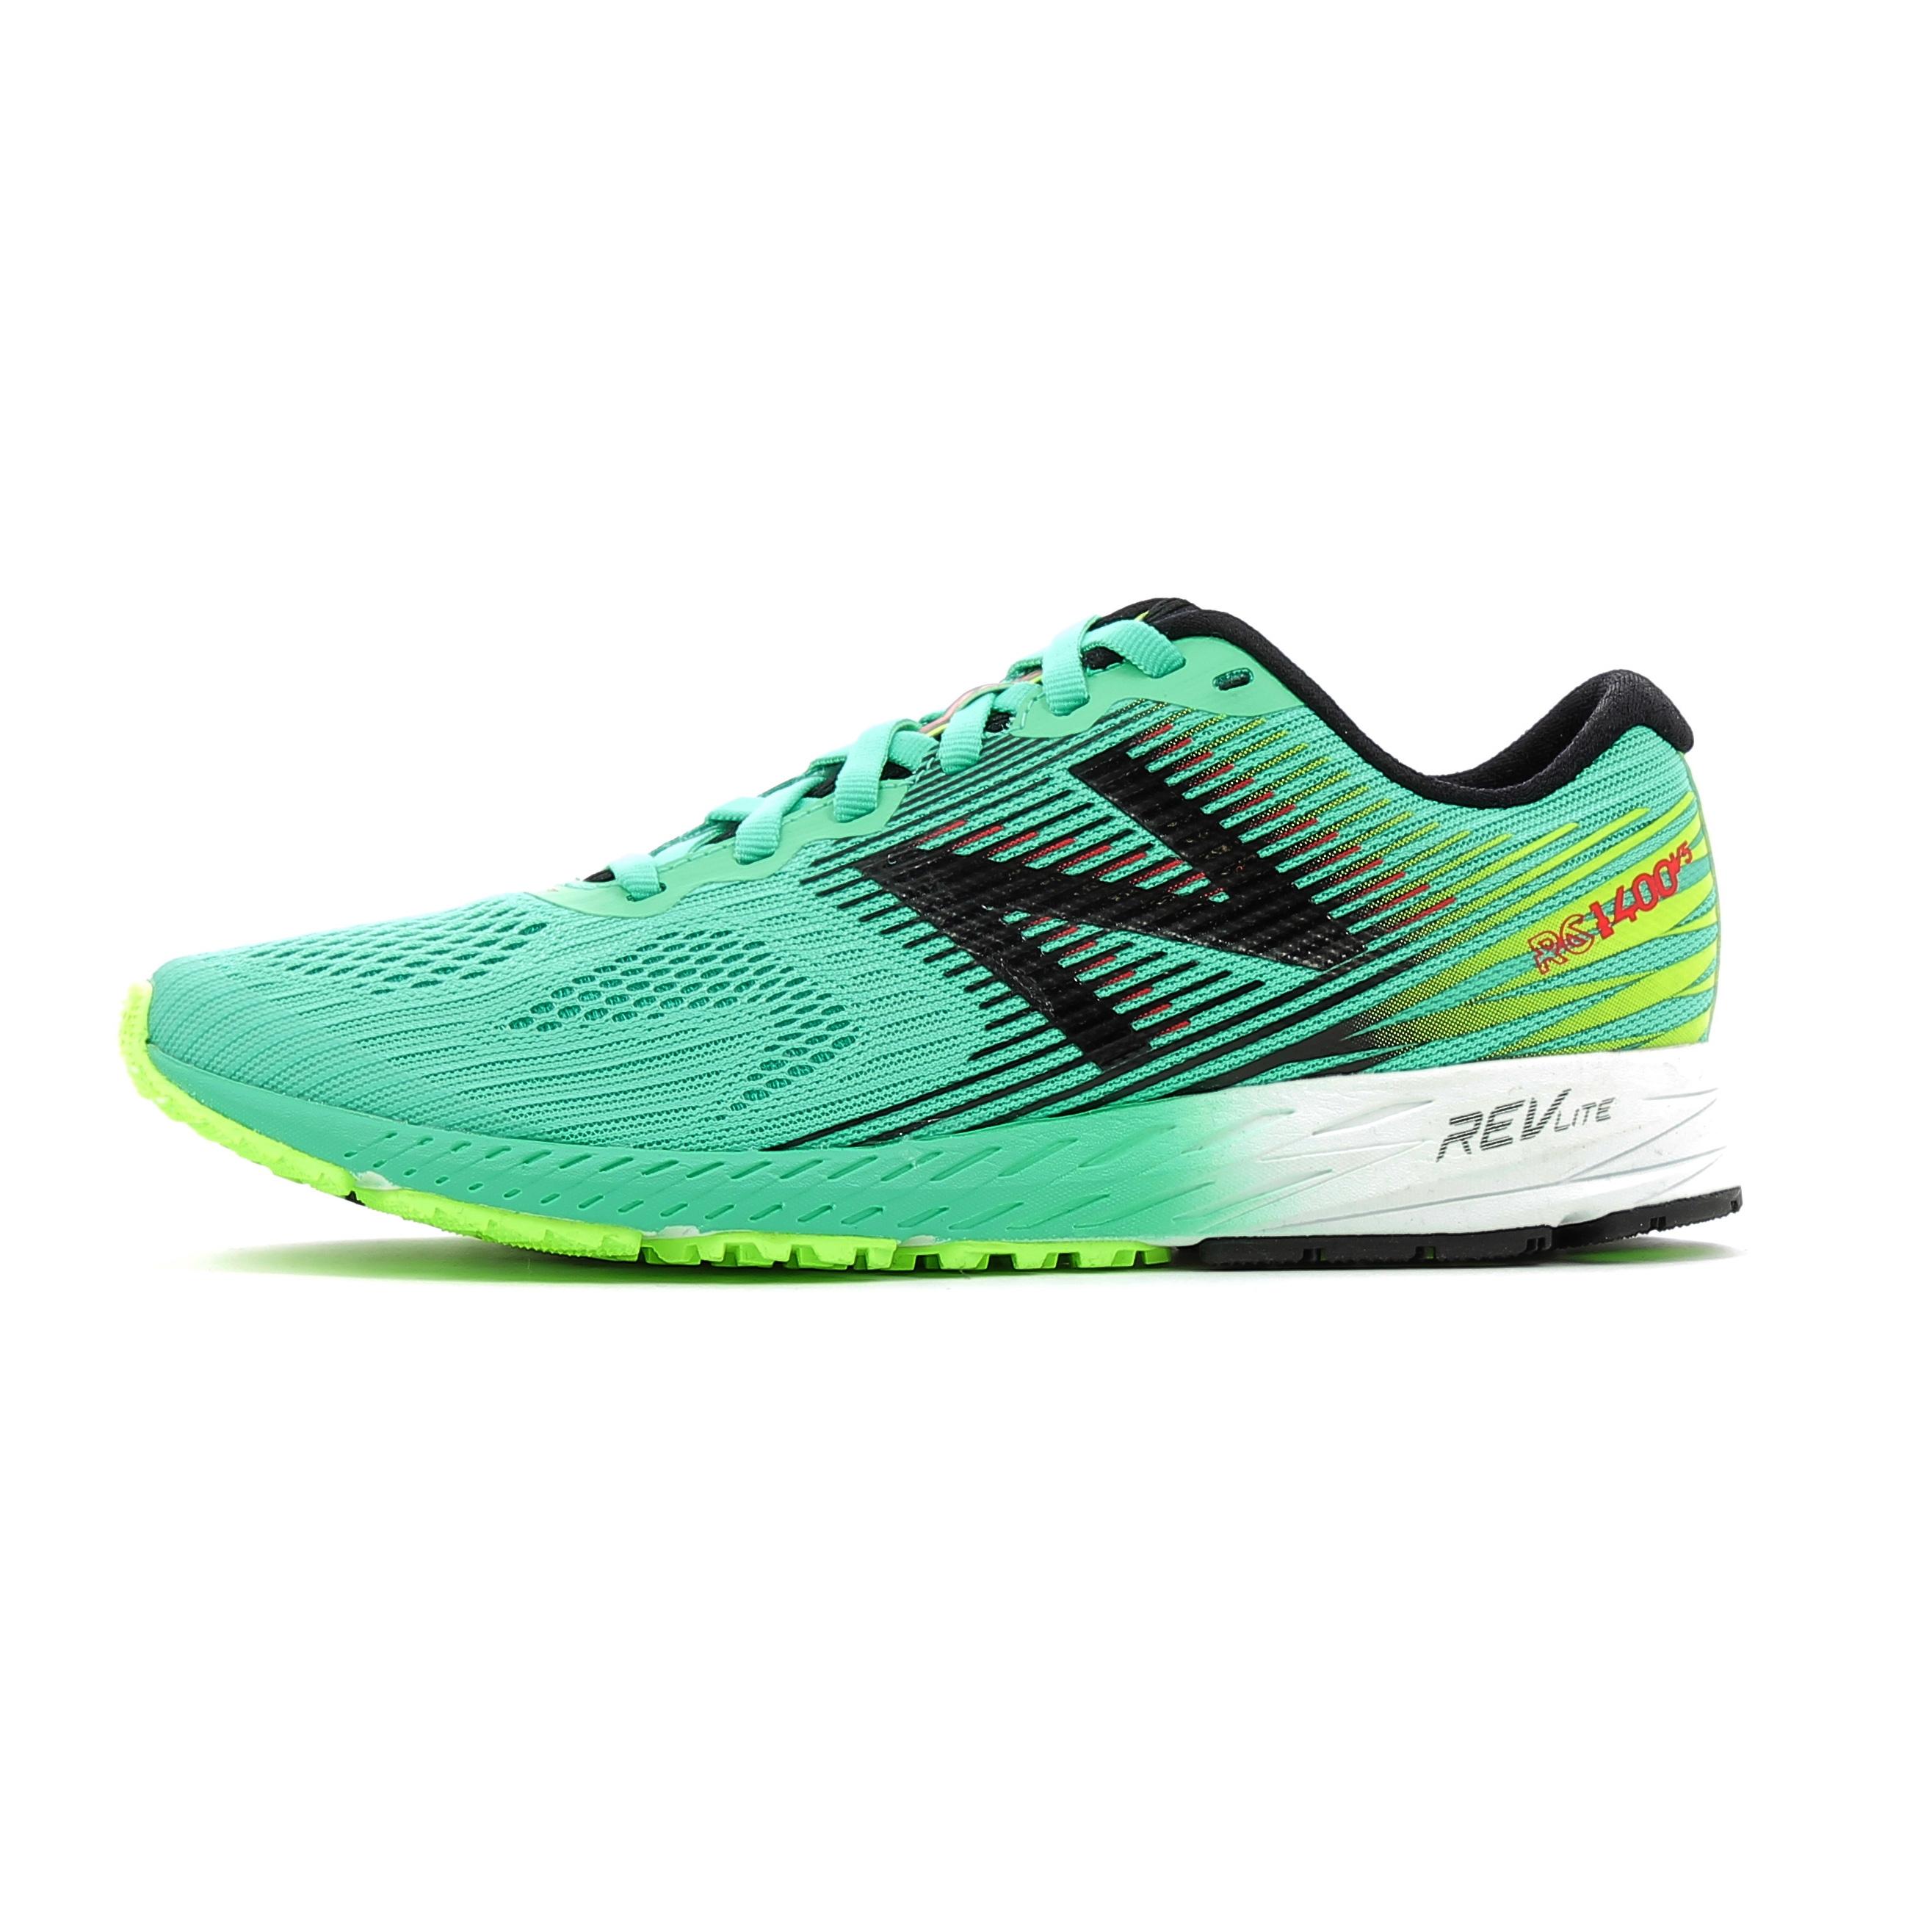 premium selection 2f402 24656 Chaussures de running New Balance W1400 B